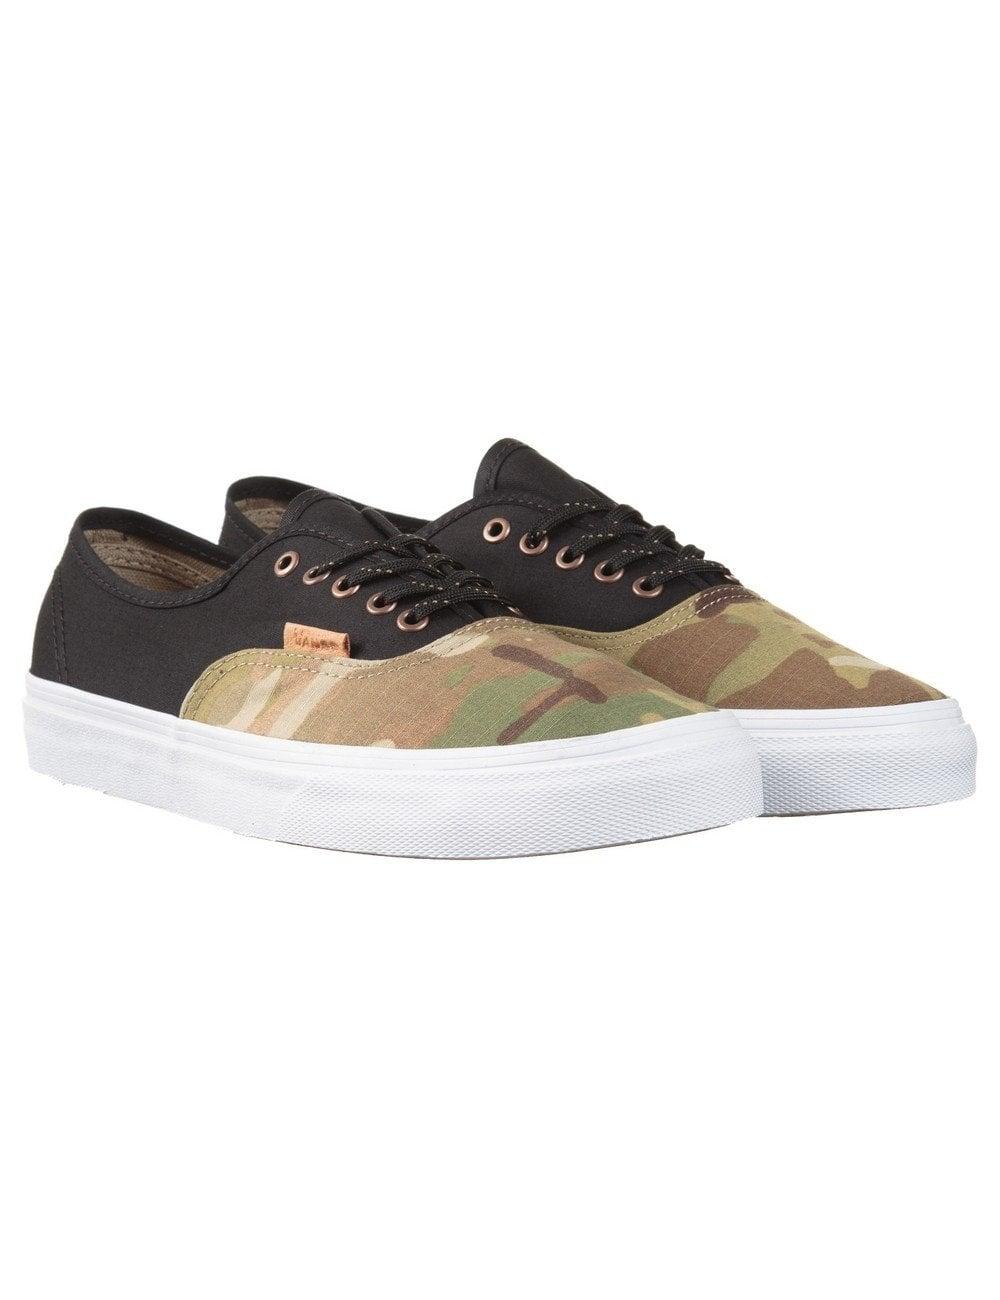 17c053917a Vans California Authentic Trainers - Black (Multicamo) - Footwear ...